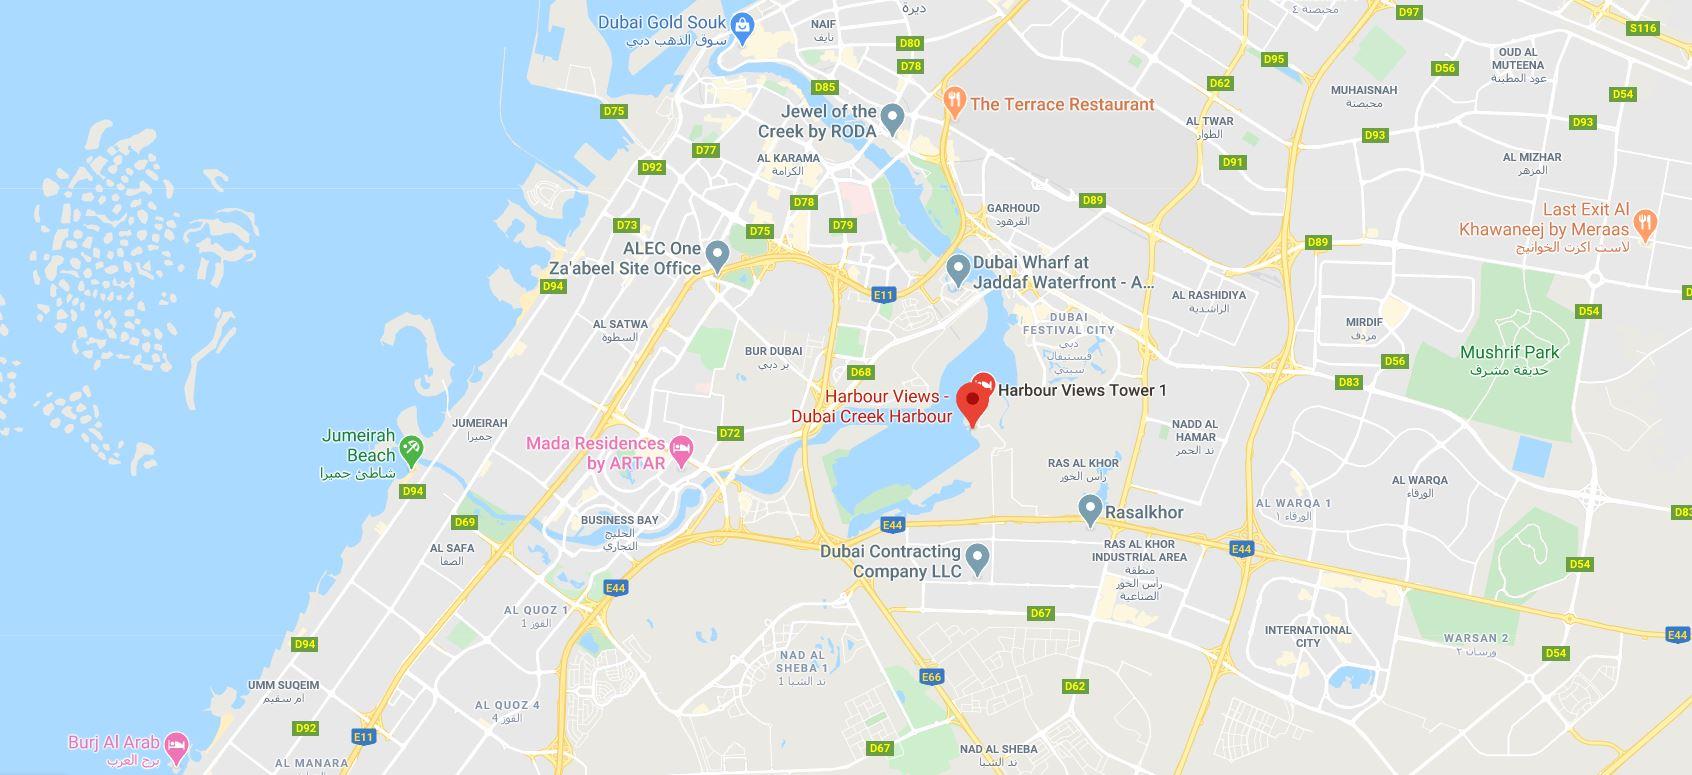 Creek-Harbour-Views Location Map